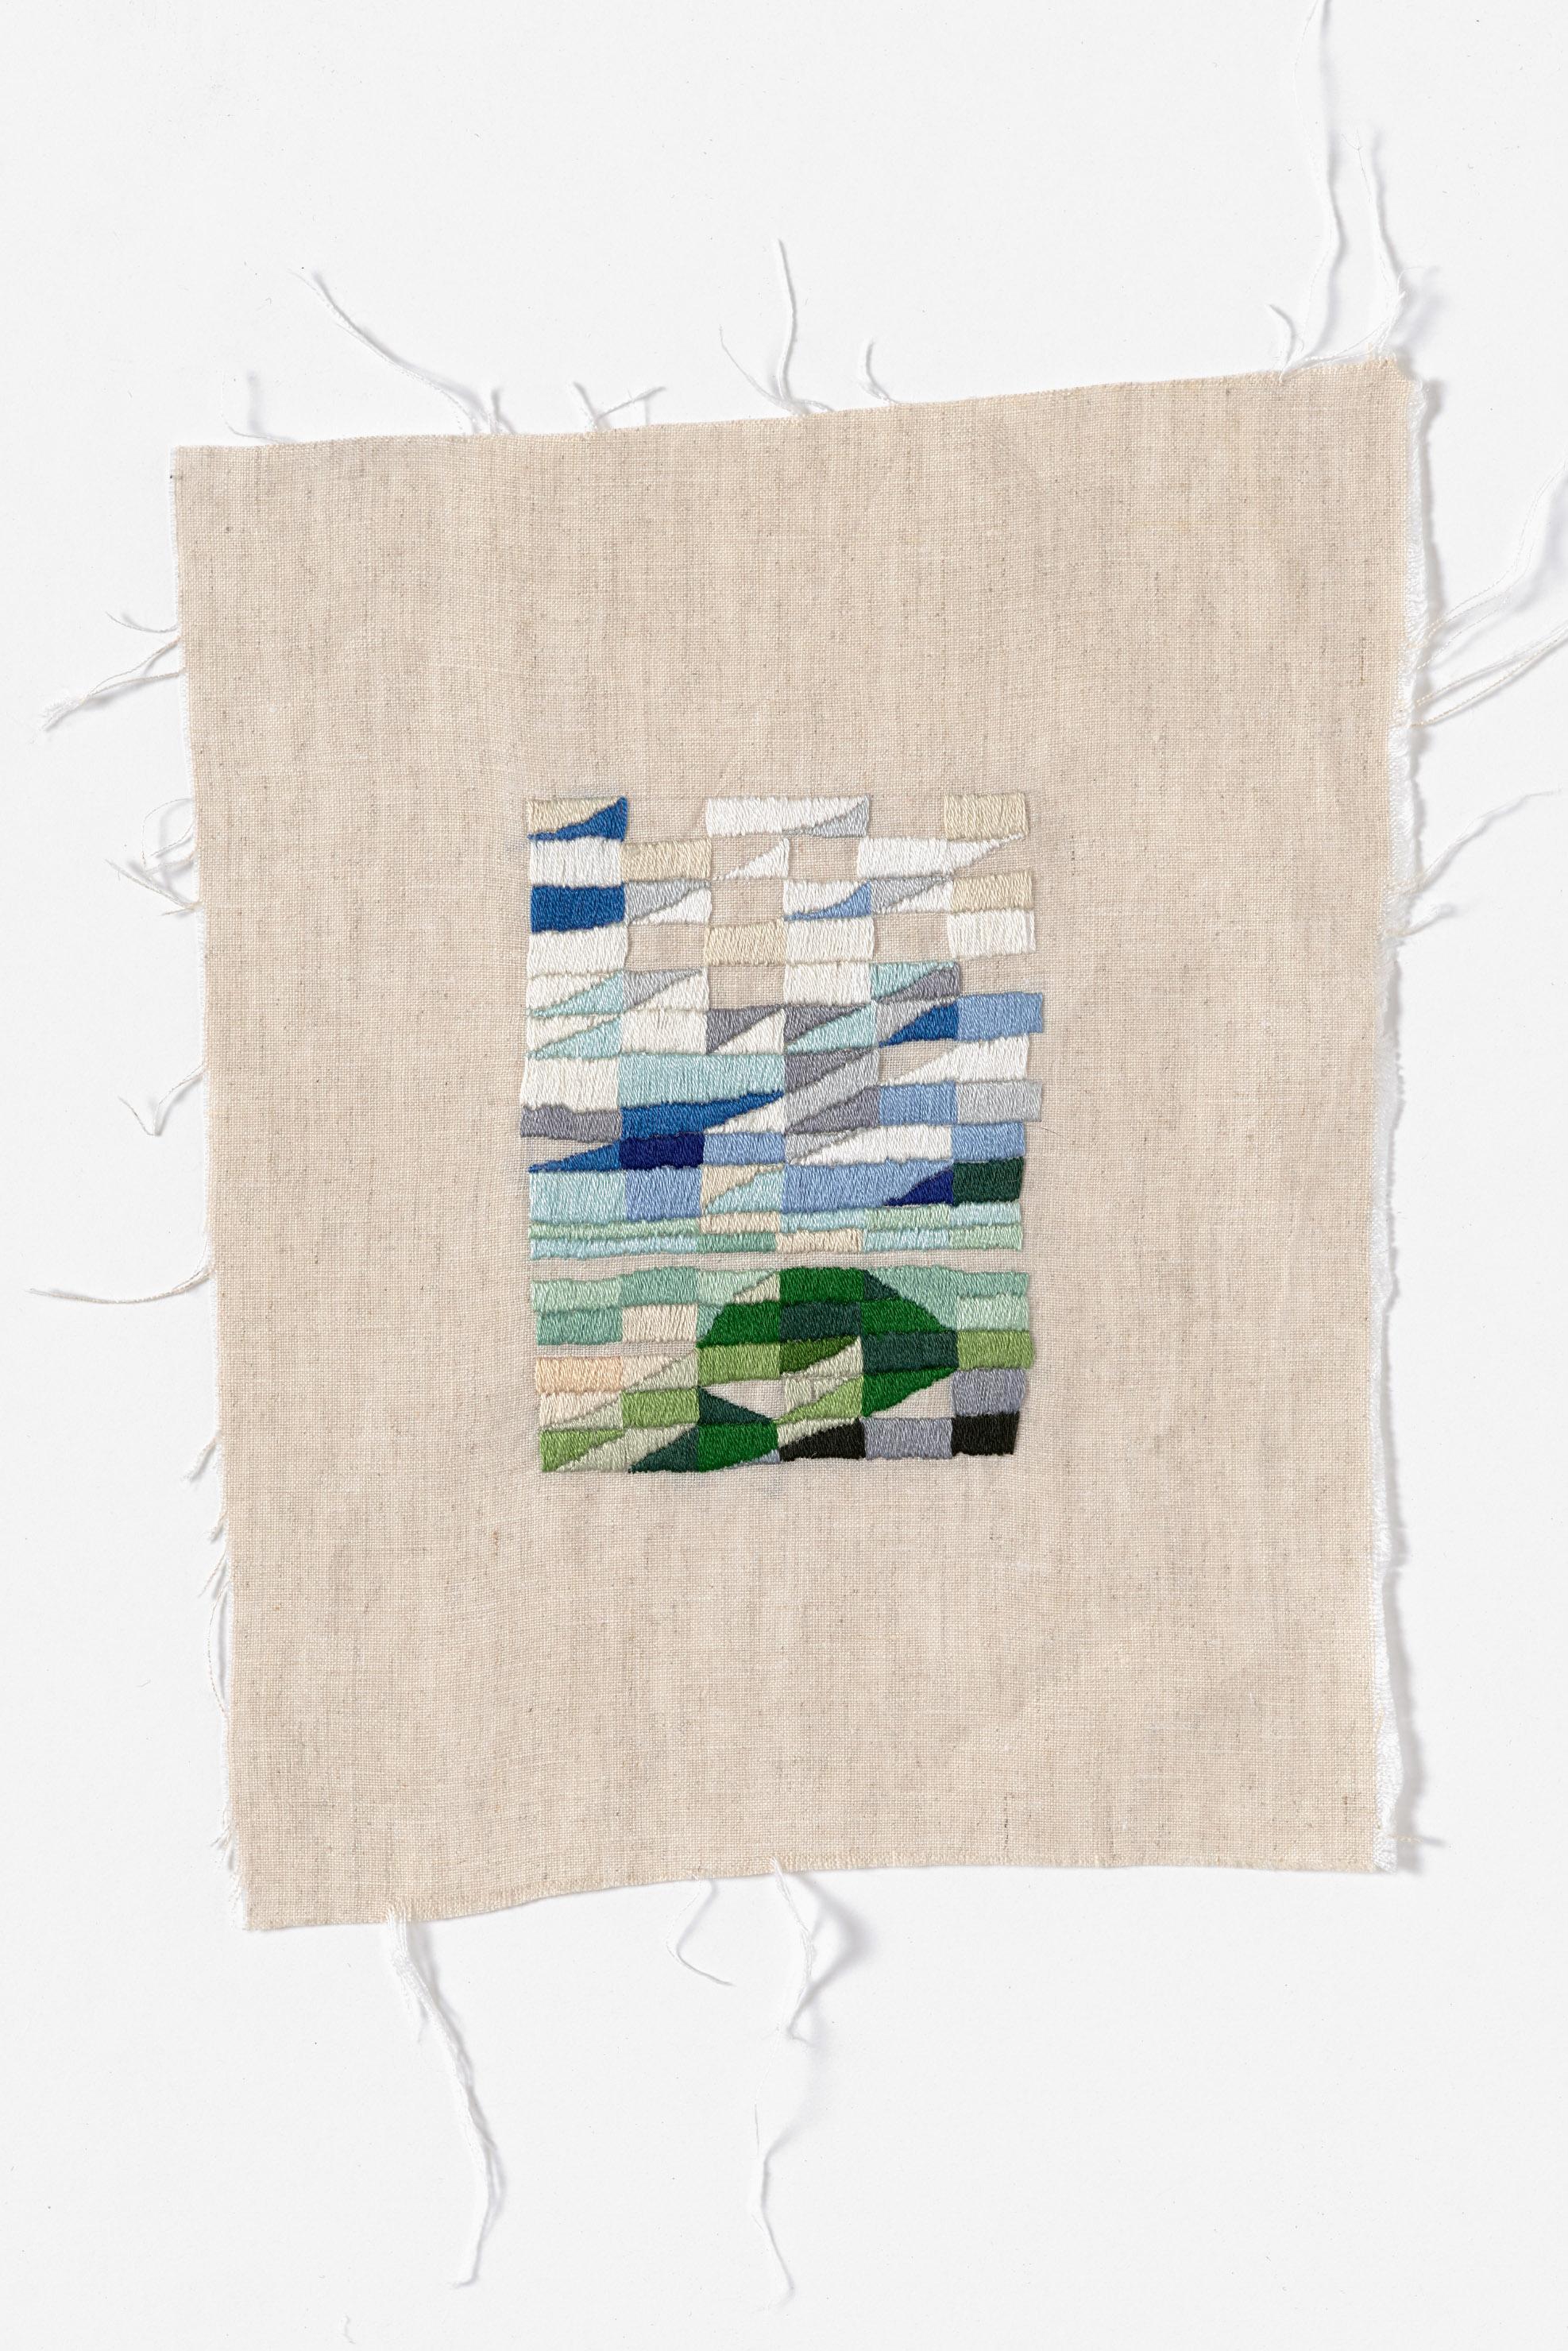 Carpark, Venus Bay  2015 Cotton thread on linen 21 x 27cm